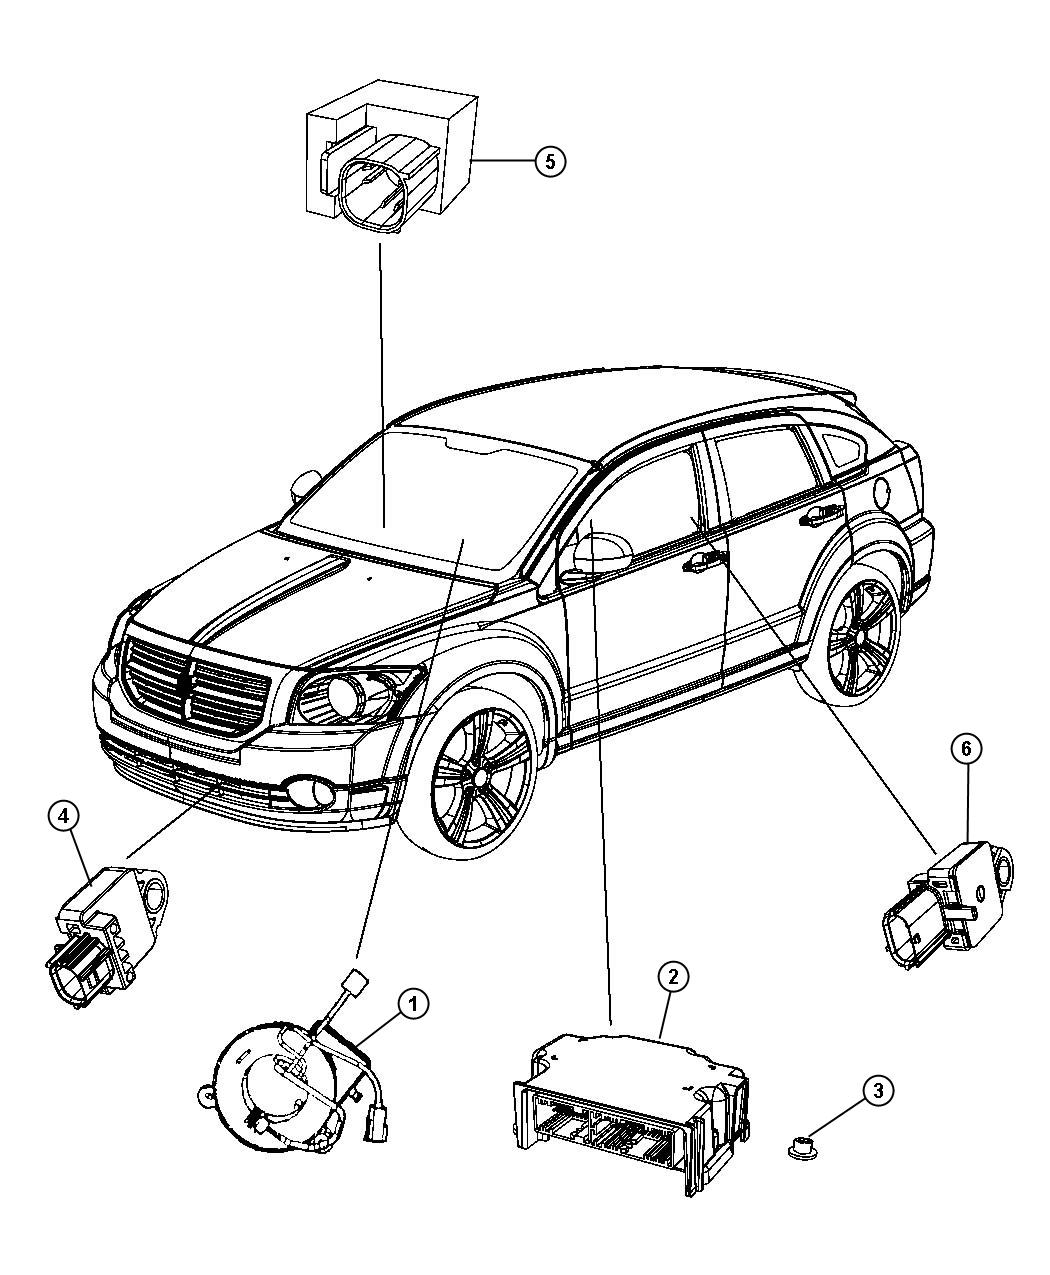 Service manual [Replace 2009 Pontiac Solstice Air Bag